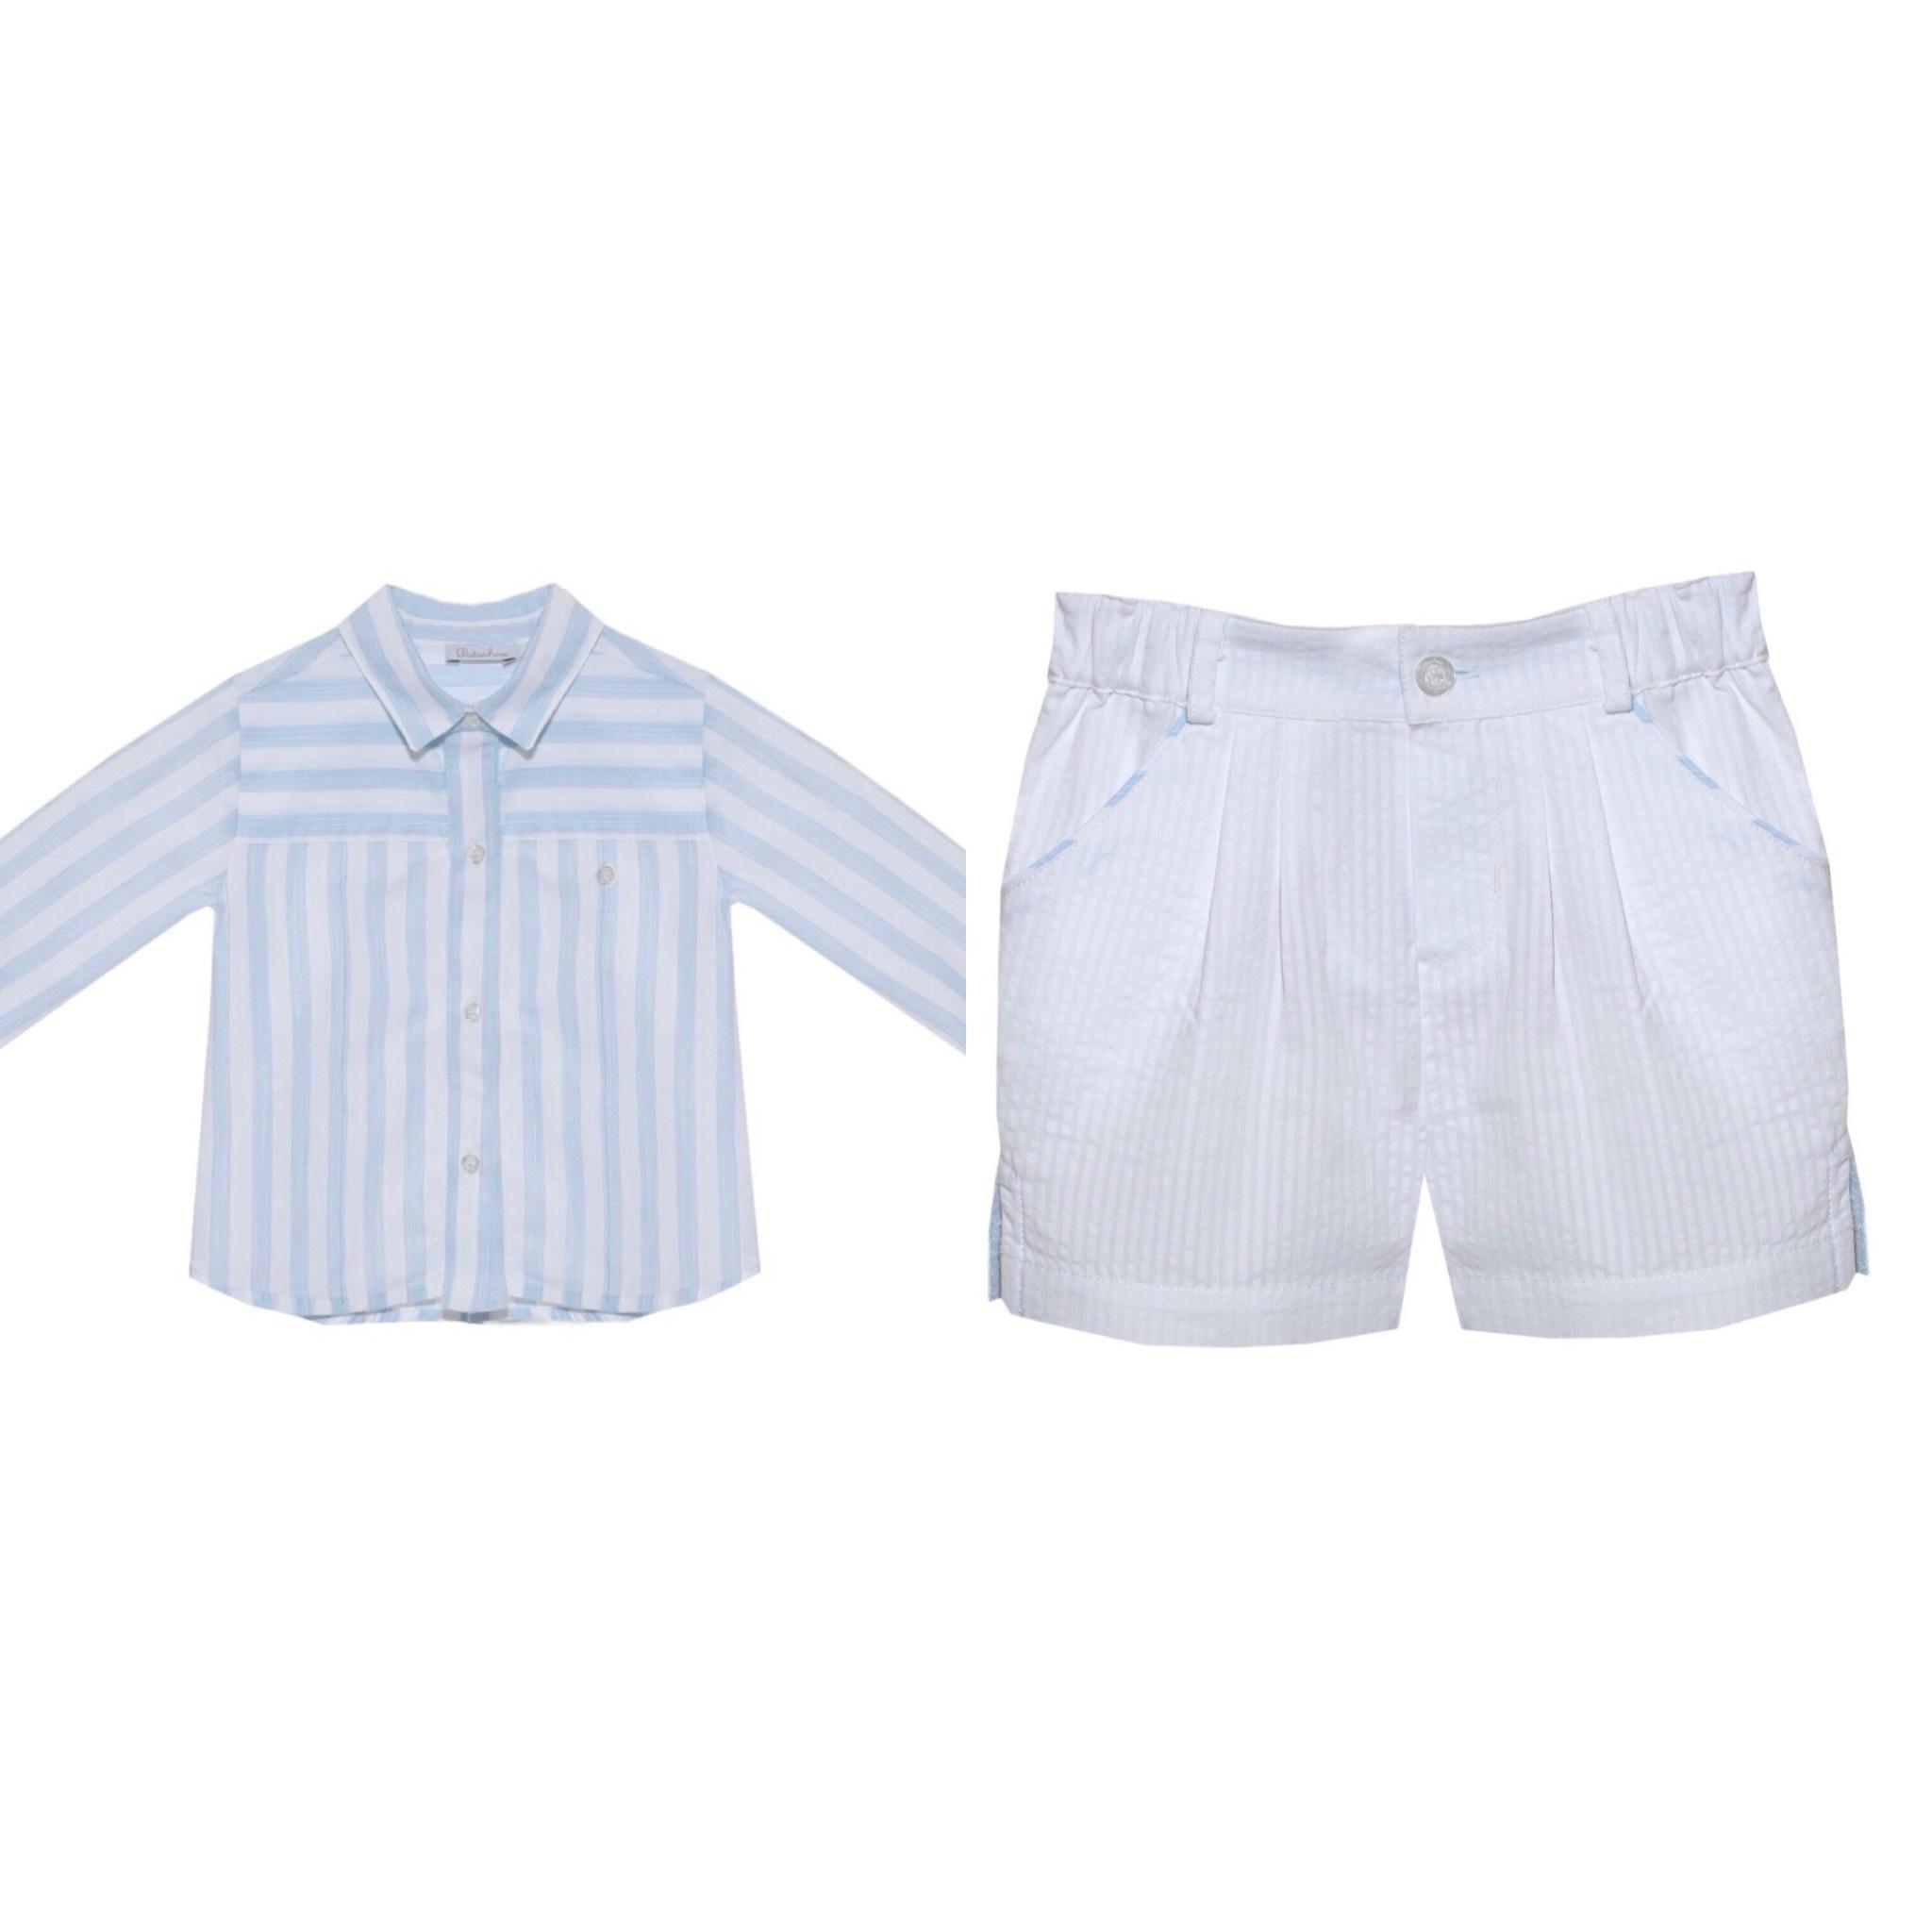 Patachou Patachou Baby 302/311 Stripe Shirt & Short Set